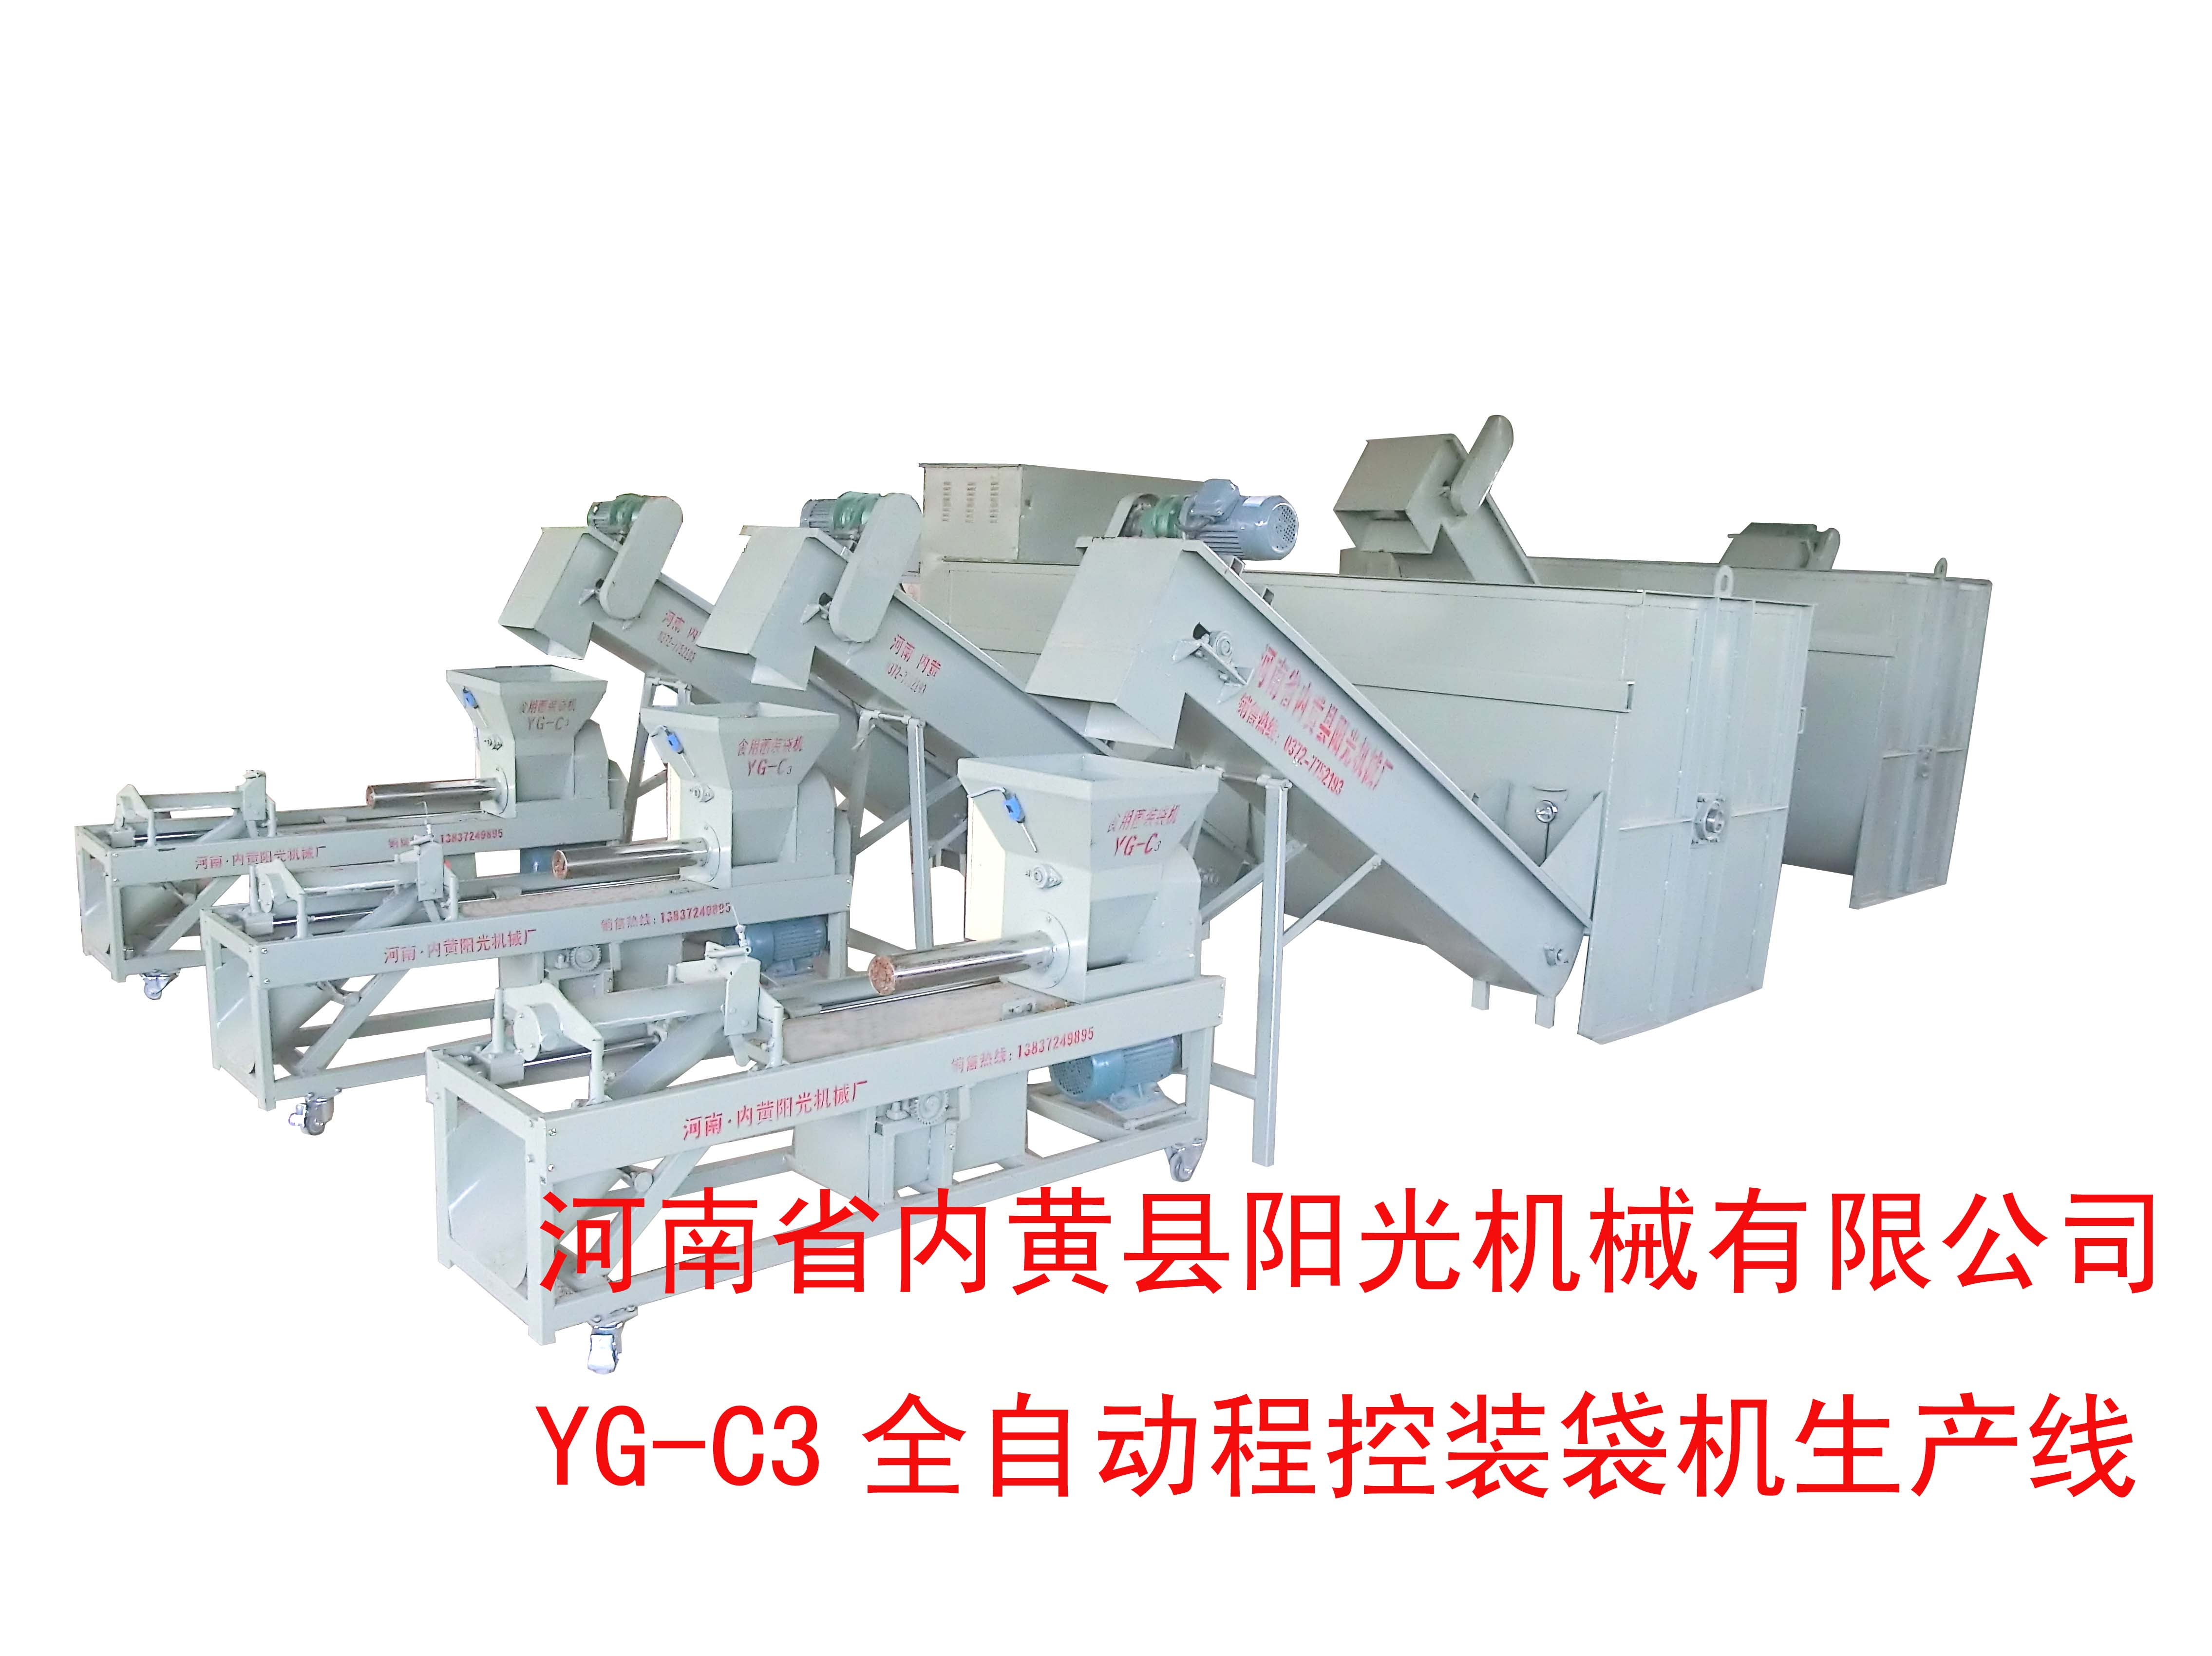 YG-C3螺旋装袋生产线